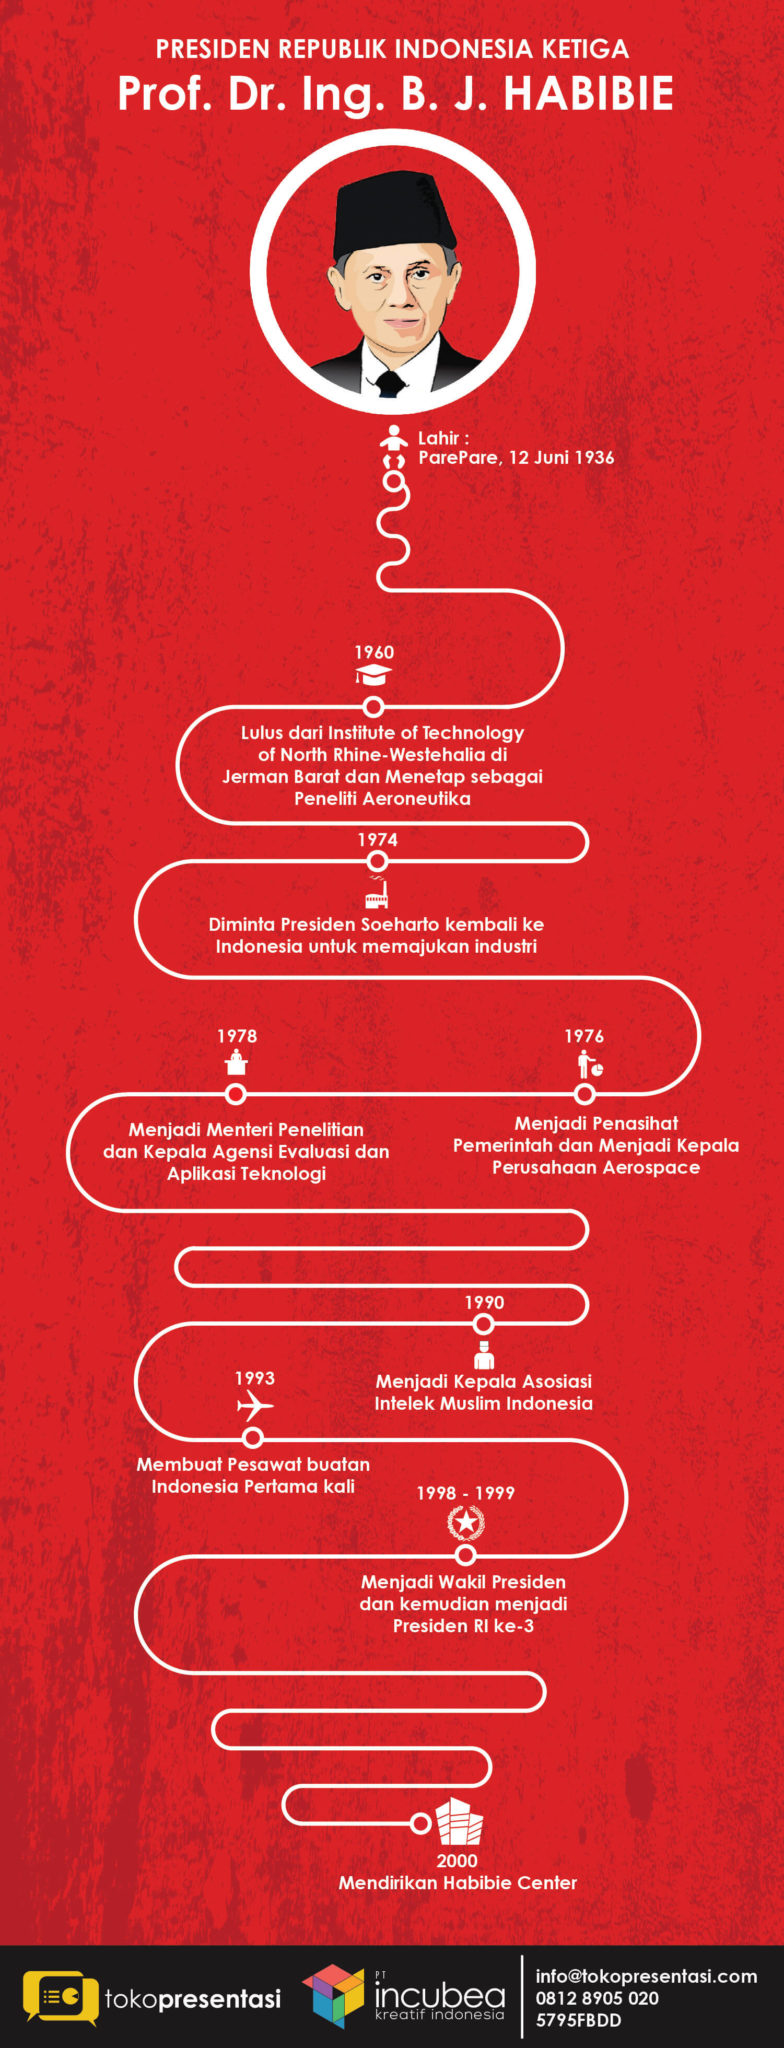 Infografis Presiden RI Ketiga Prof. Dr. Ing. B. J. HABIBIE jasa infografis tokopresentasi-07 new-07